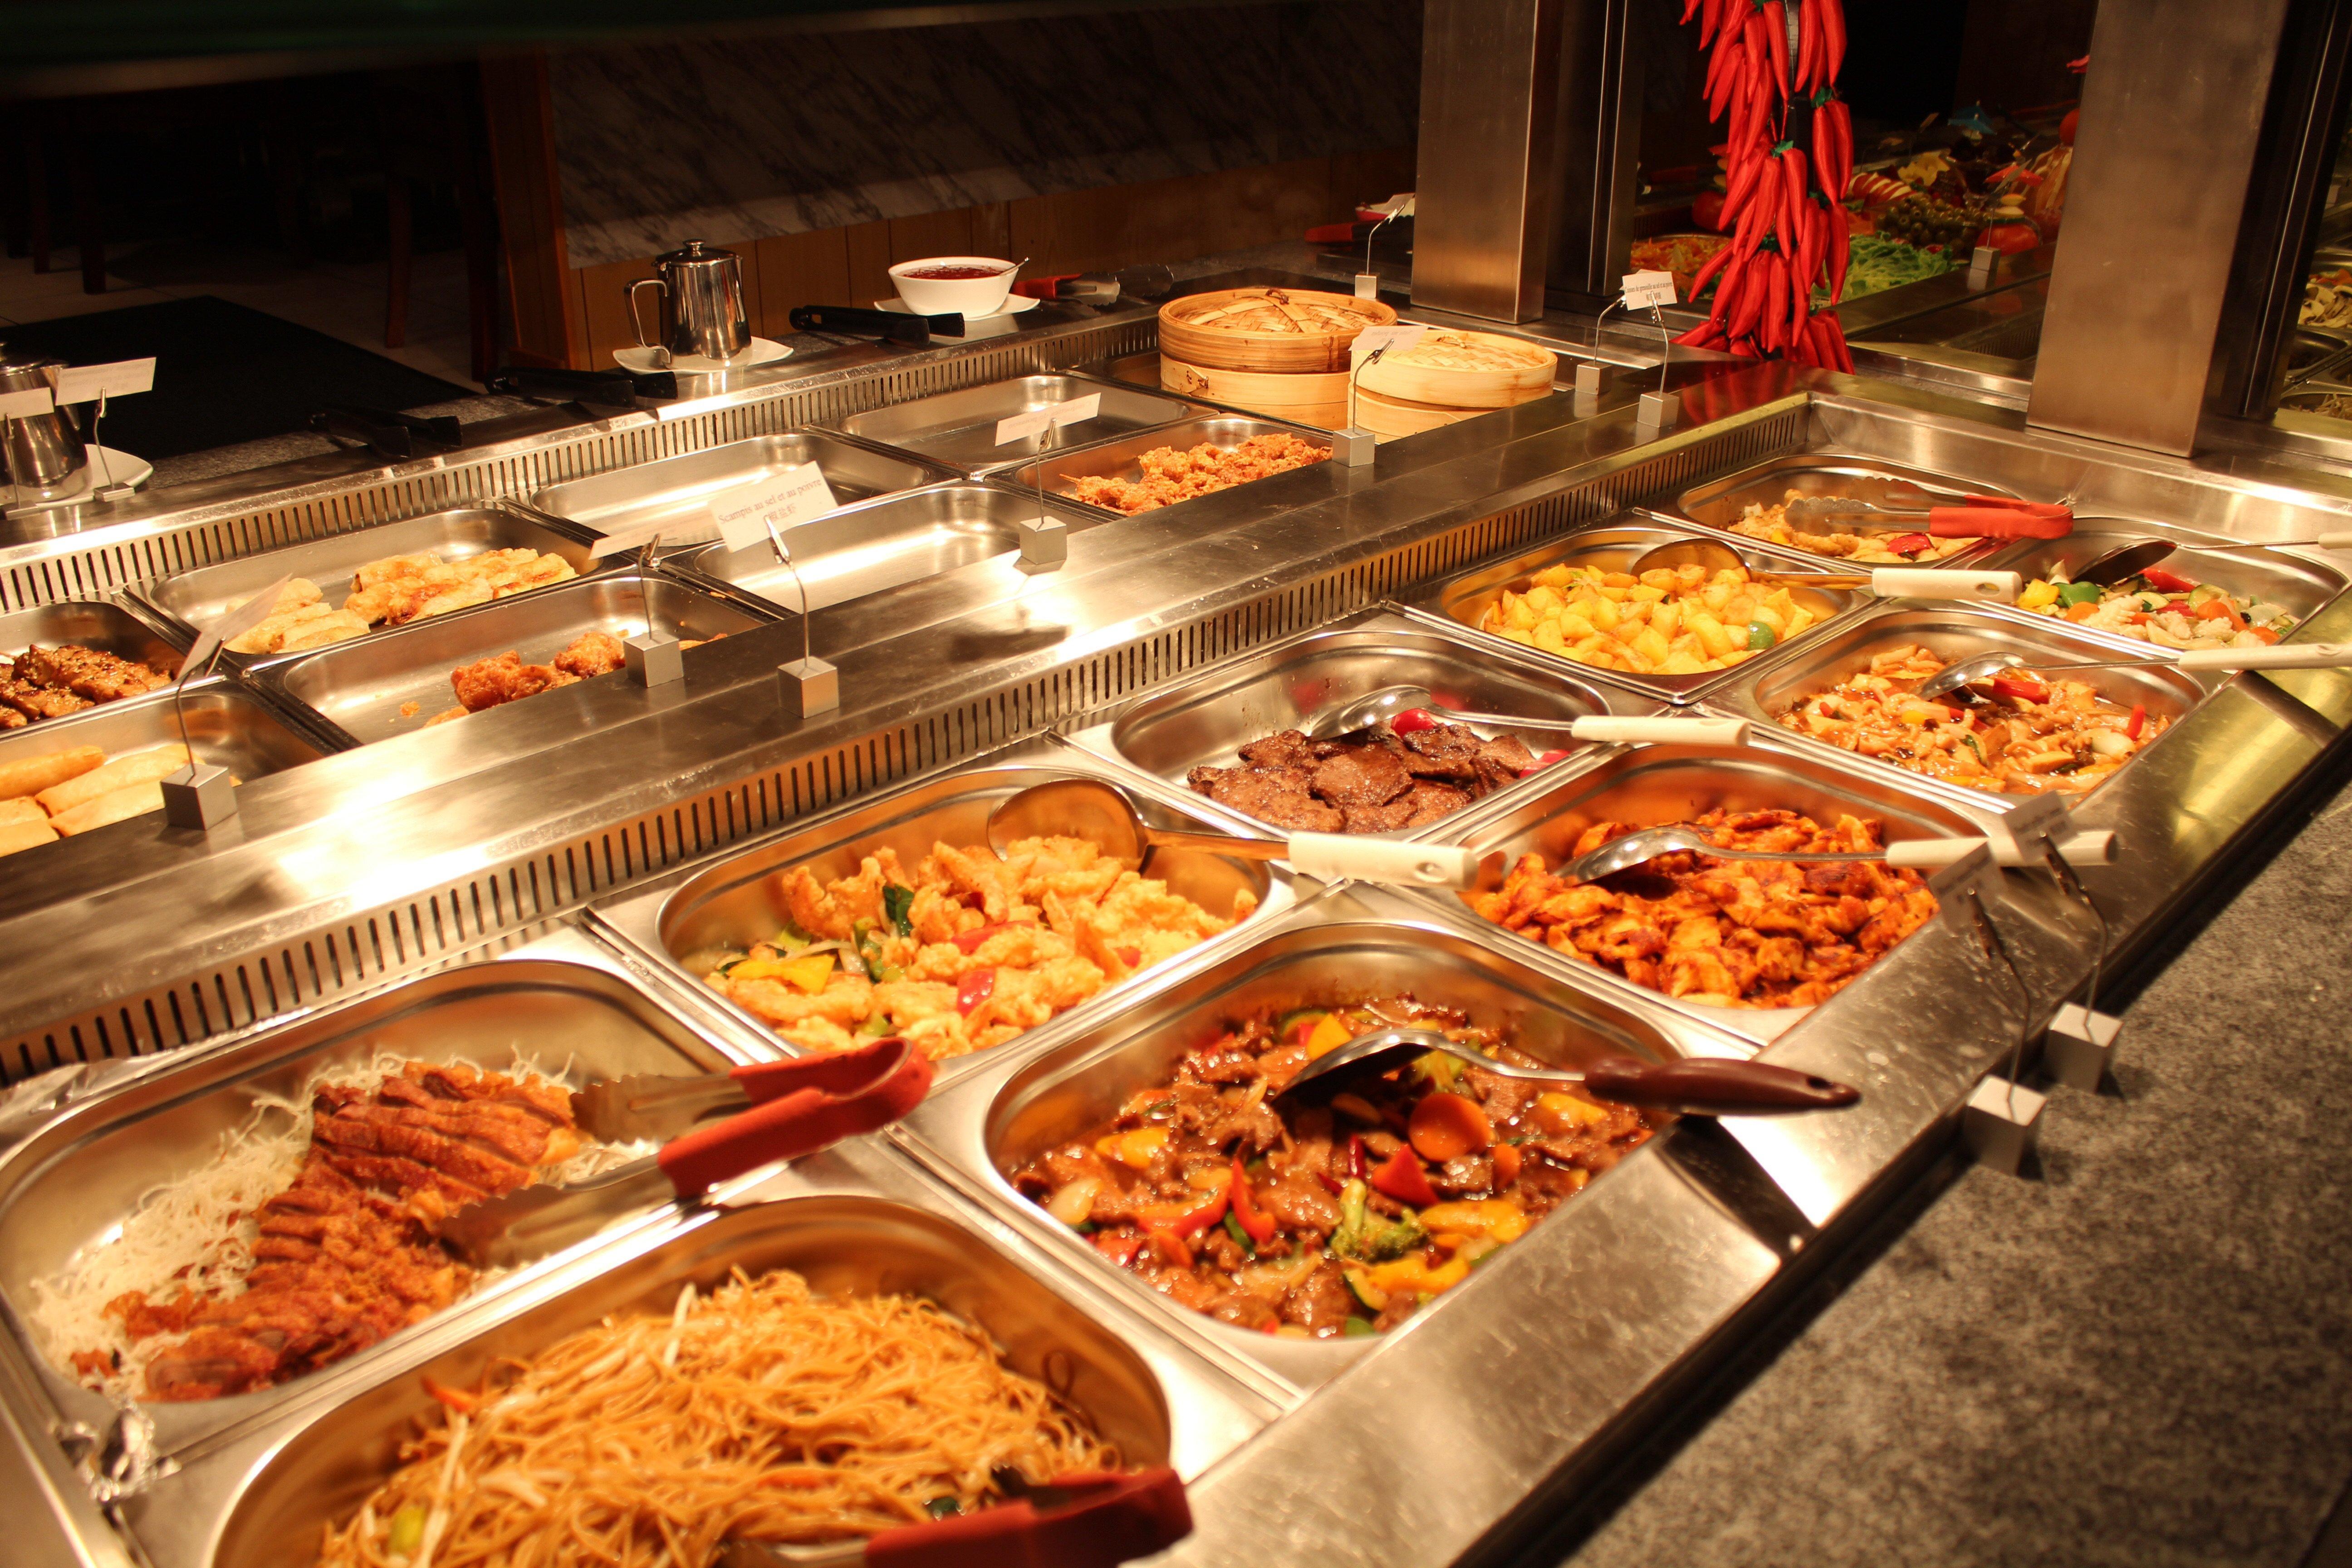 Vallee du panda restaurant asiatique rumelange 3730 for Yankey cuisine africaine a volonte